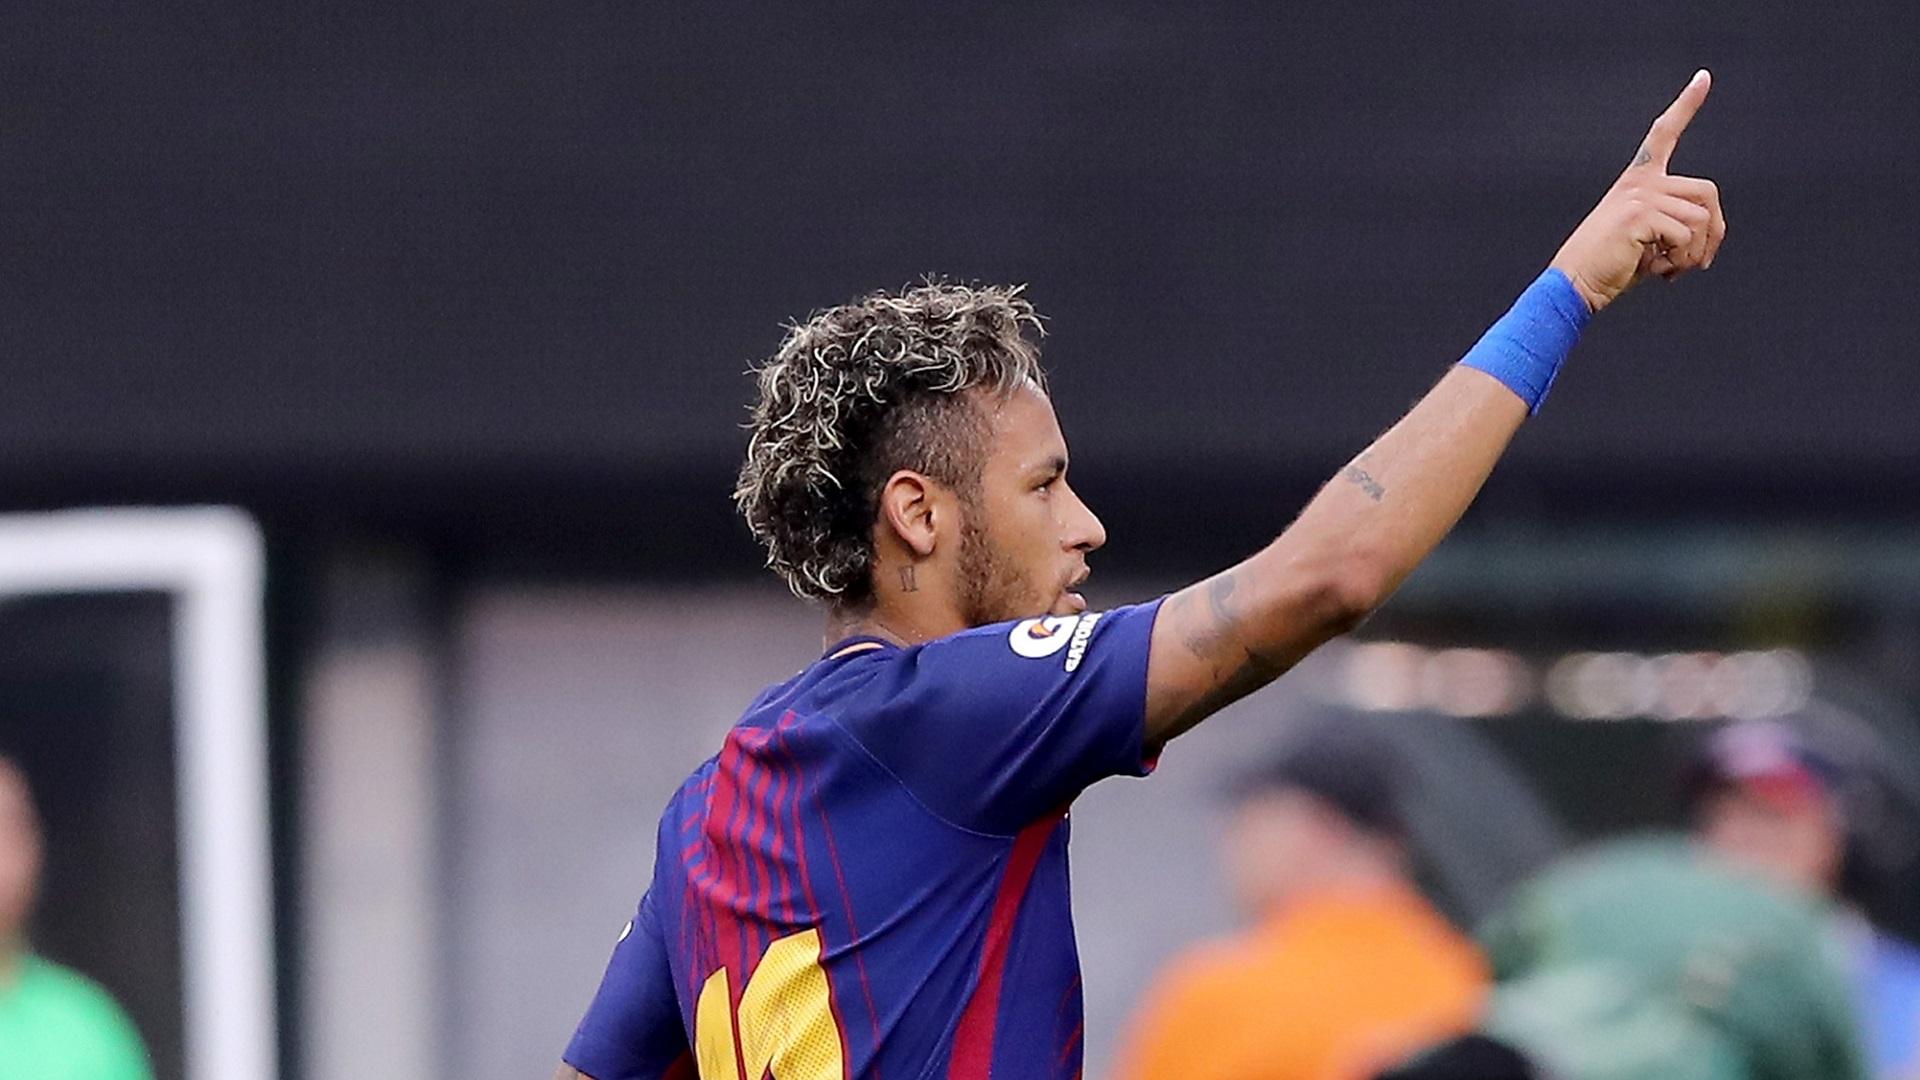 Messi le desea suerte a su